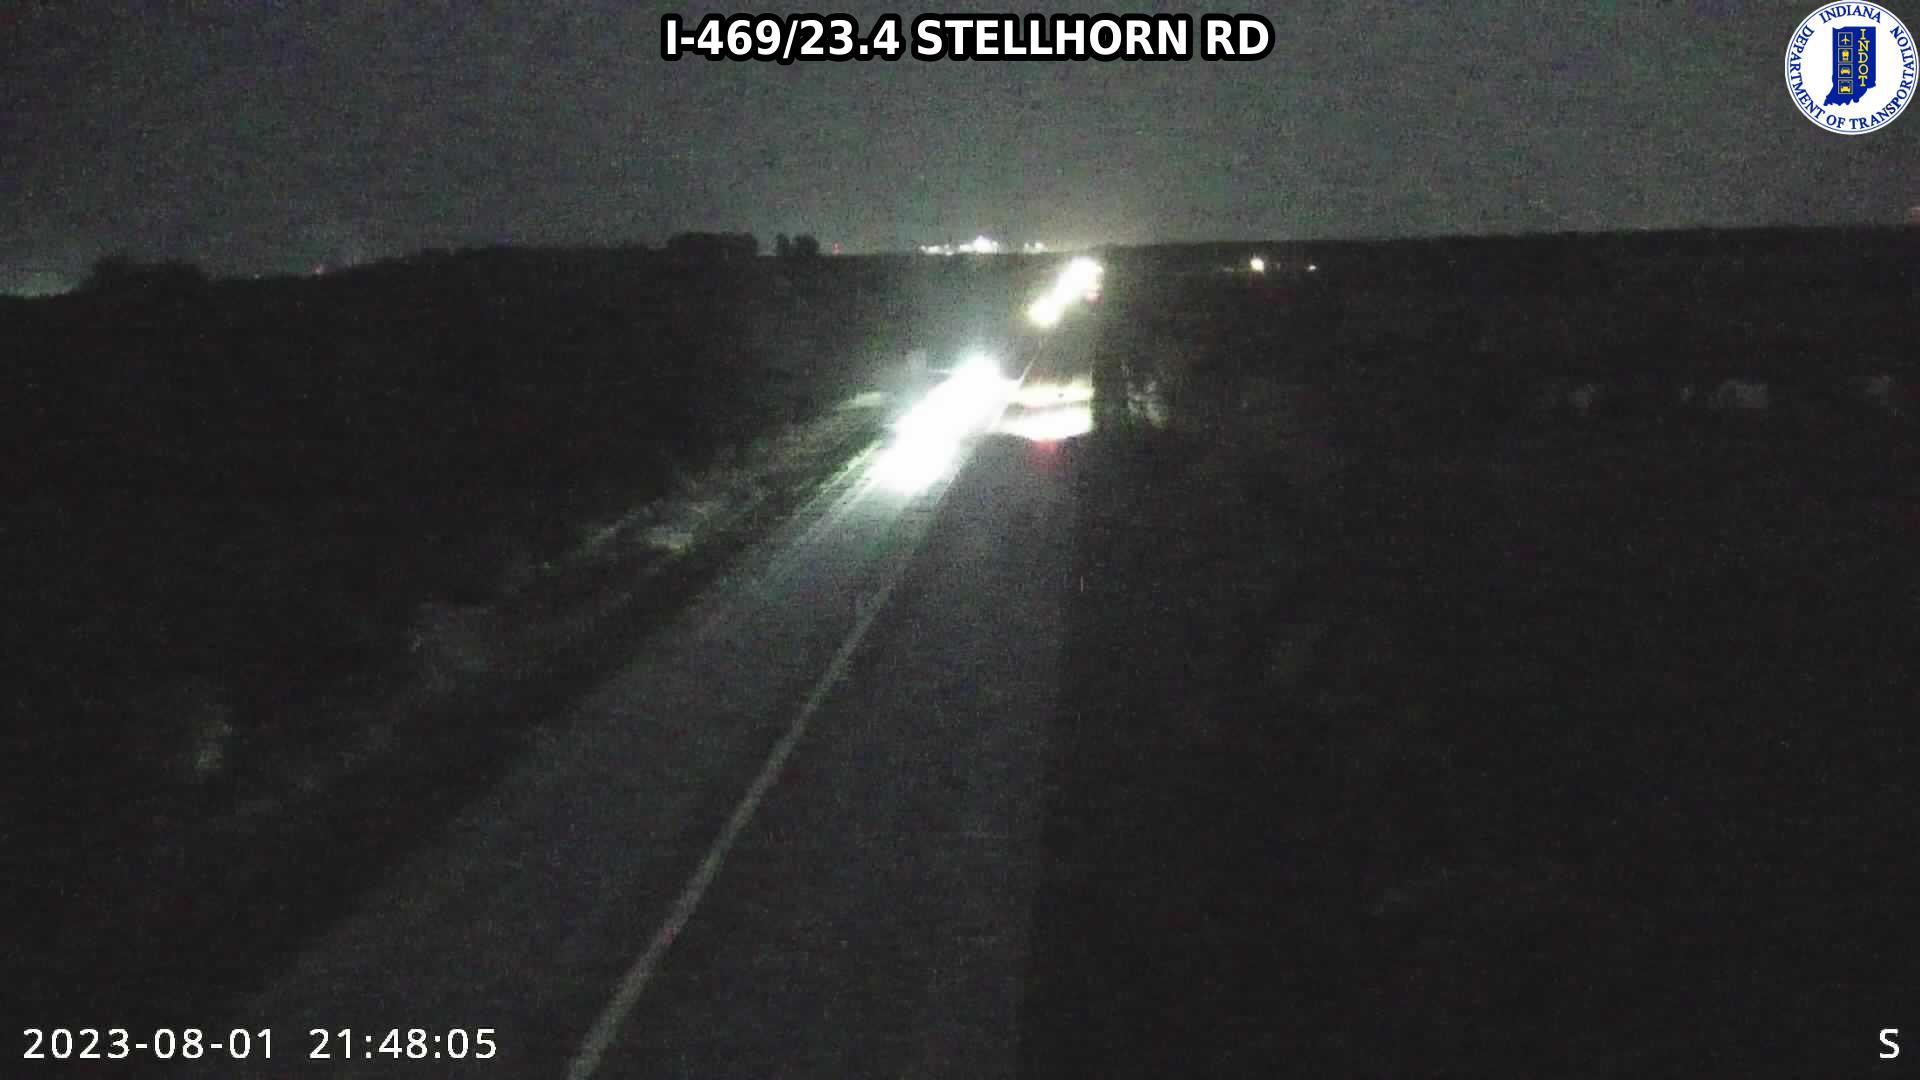 I-469 STELLHORN ROAD CAM